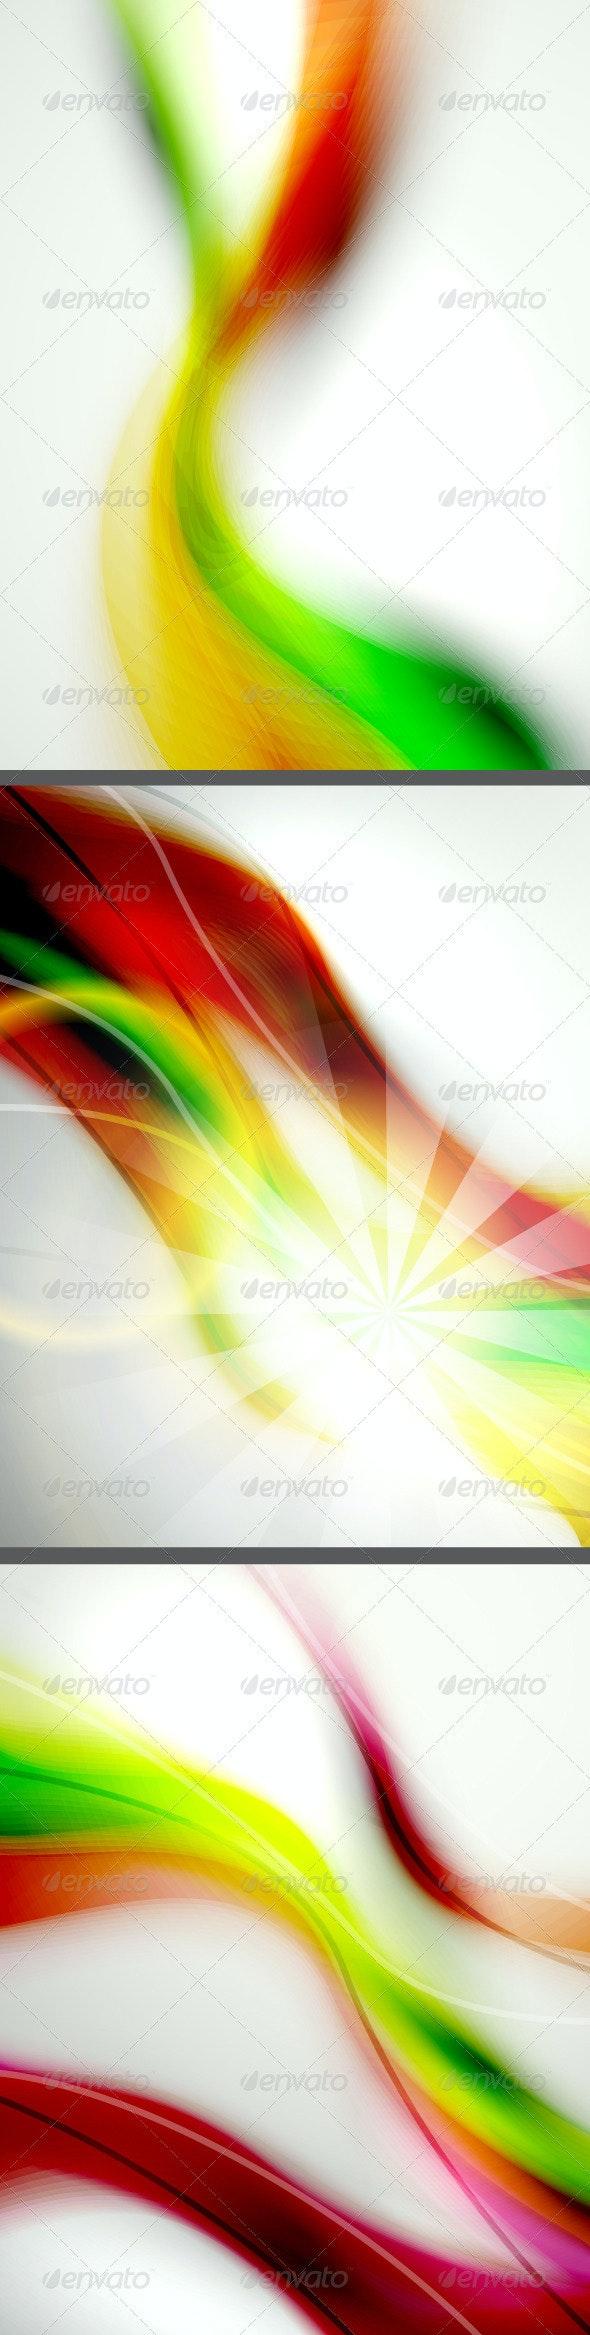 Shiny Vector Backgrounds - Backgrounds Decorative